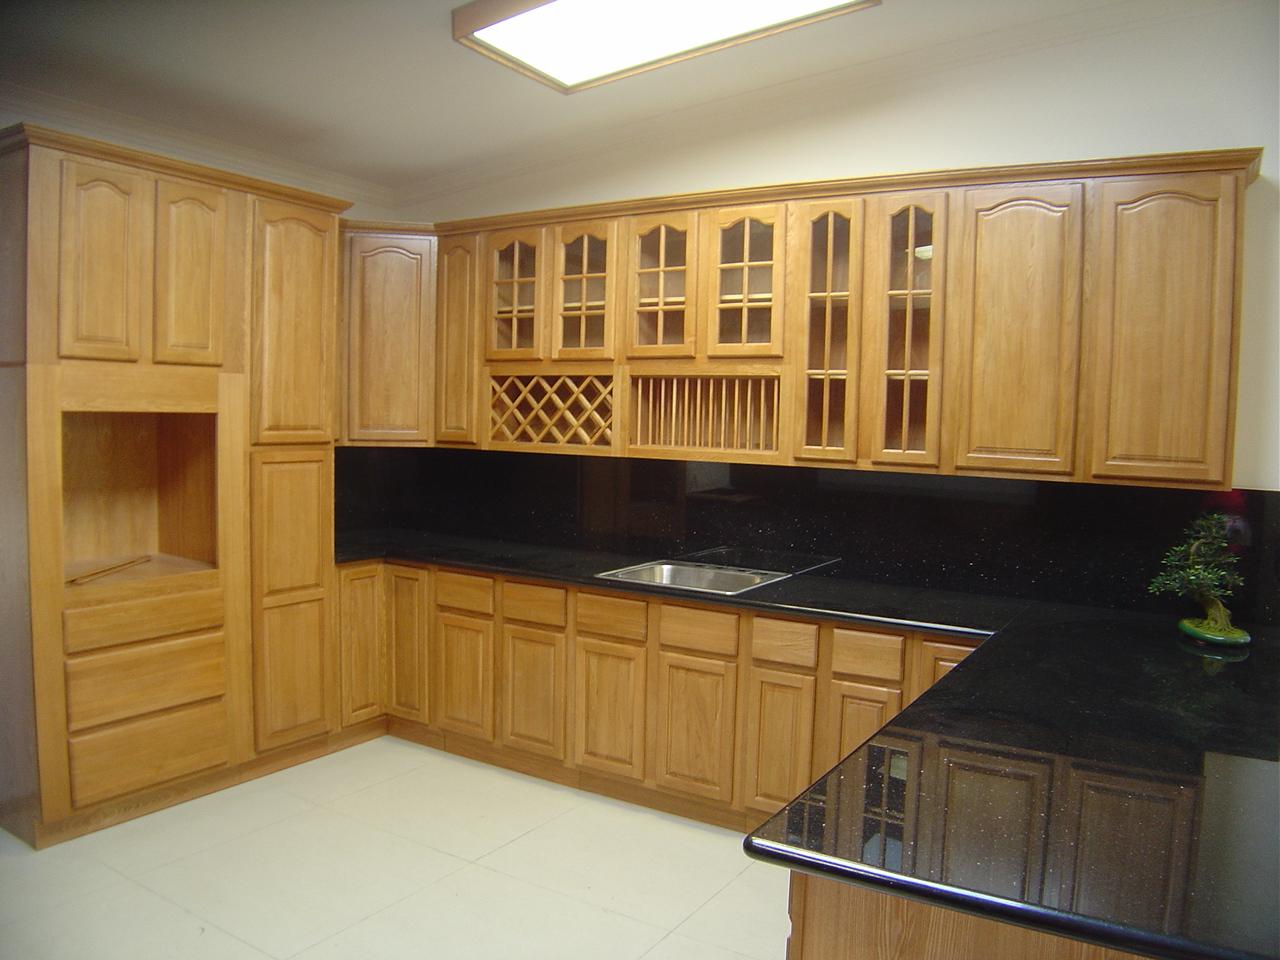 Home kitchen appliances Photo - 6